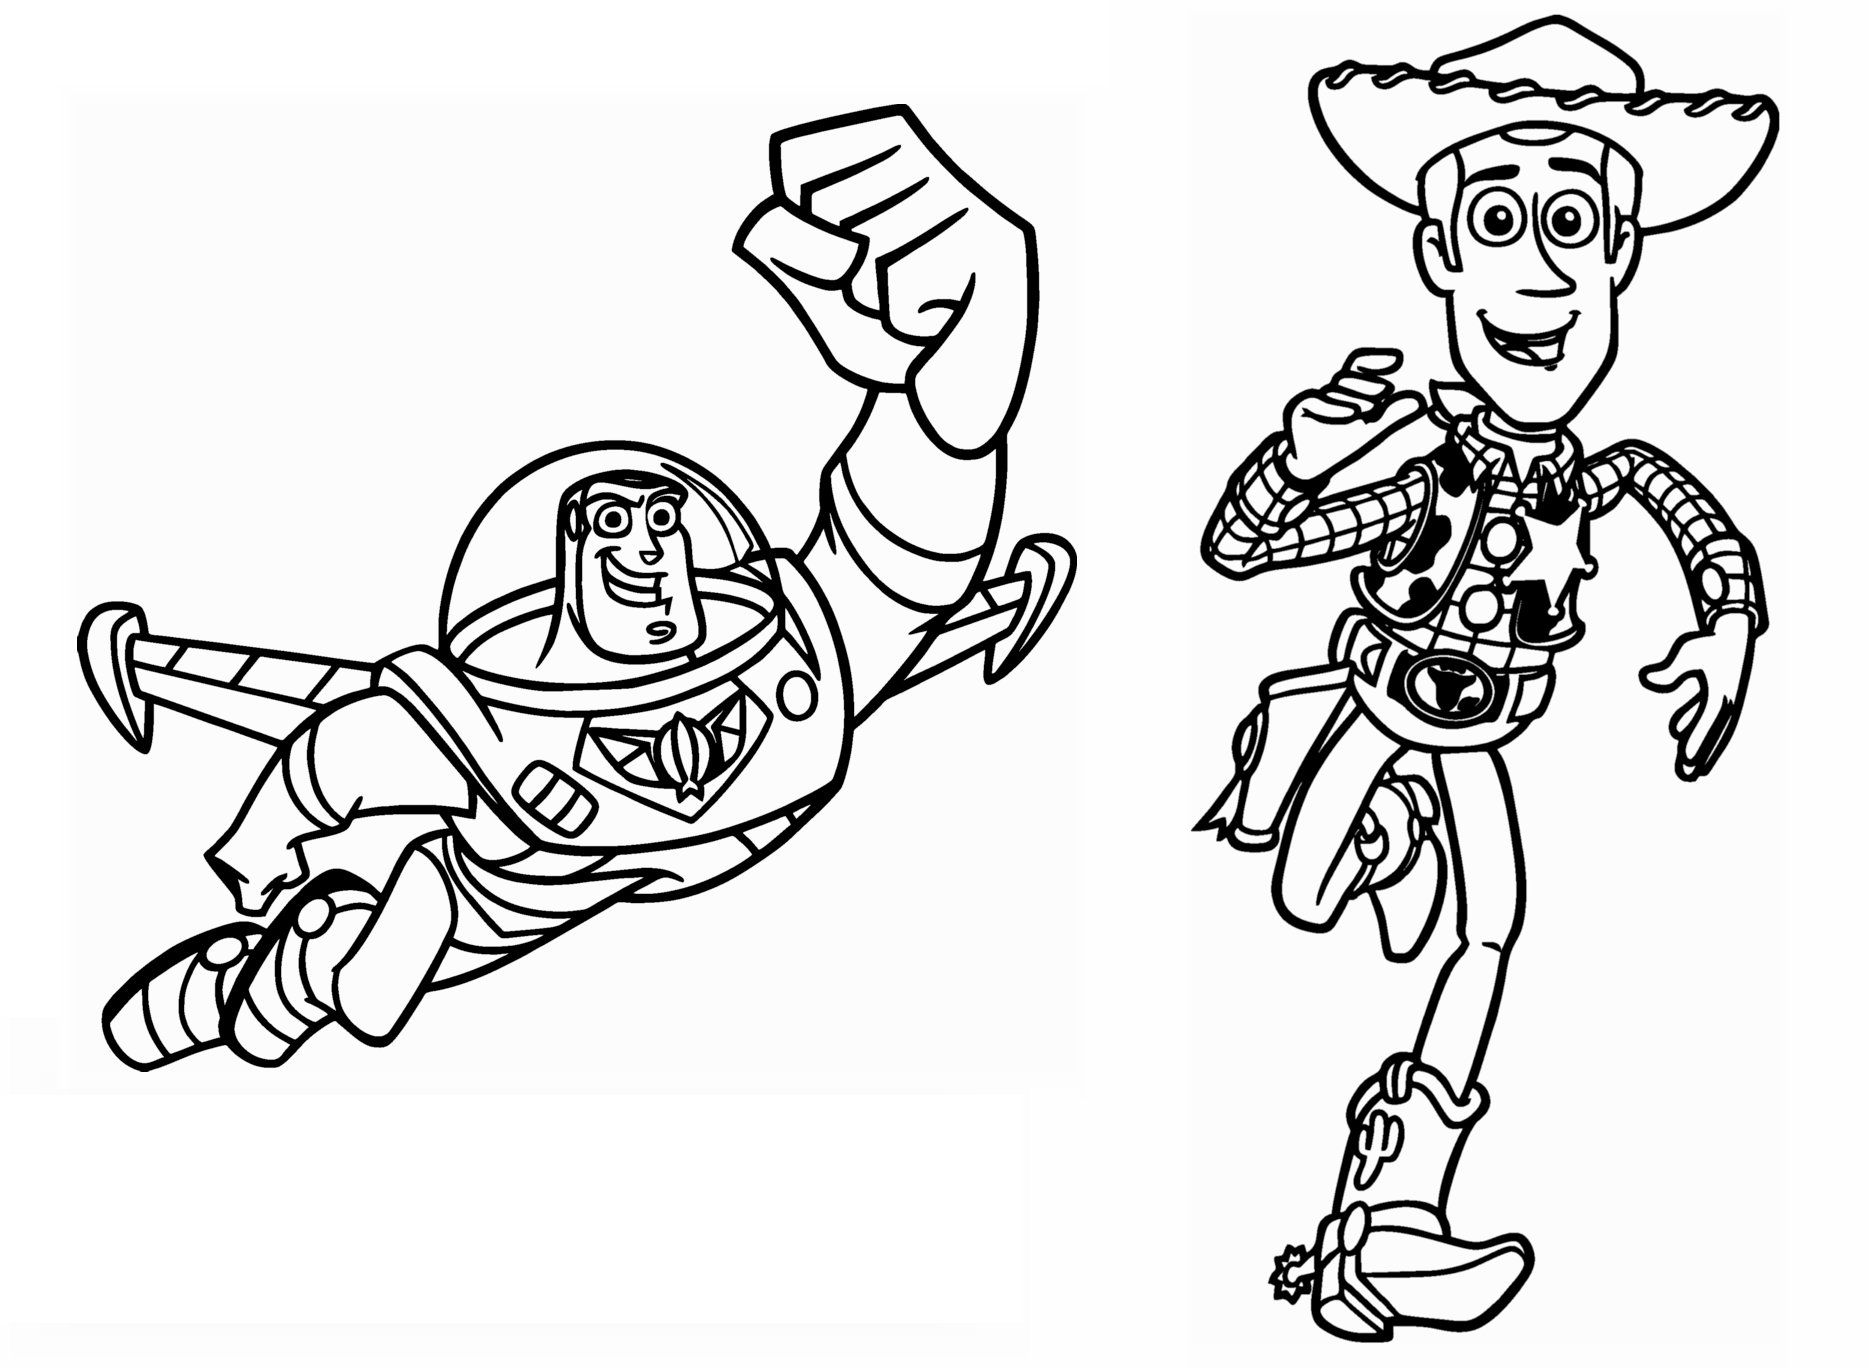 JPEG DXF eps vector, buzz circut Buzz SVG toy Toy svg Toy 2 svg buzz shirt svg buzz stensil Toy cut file